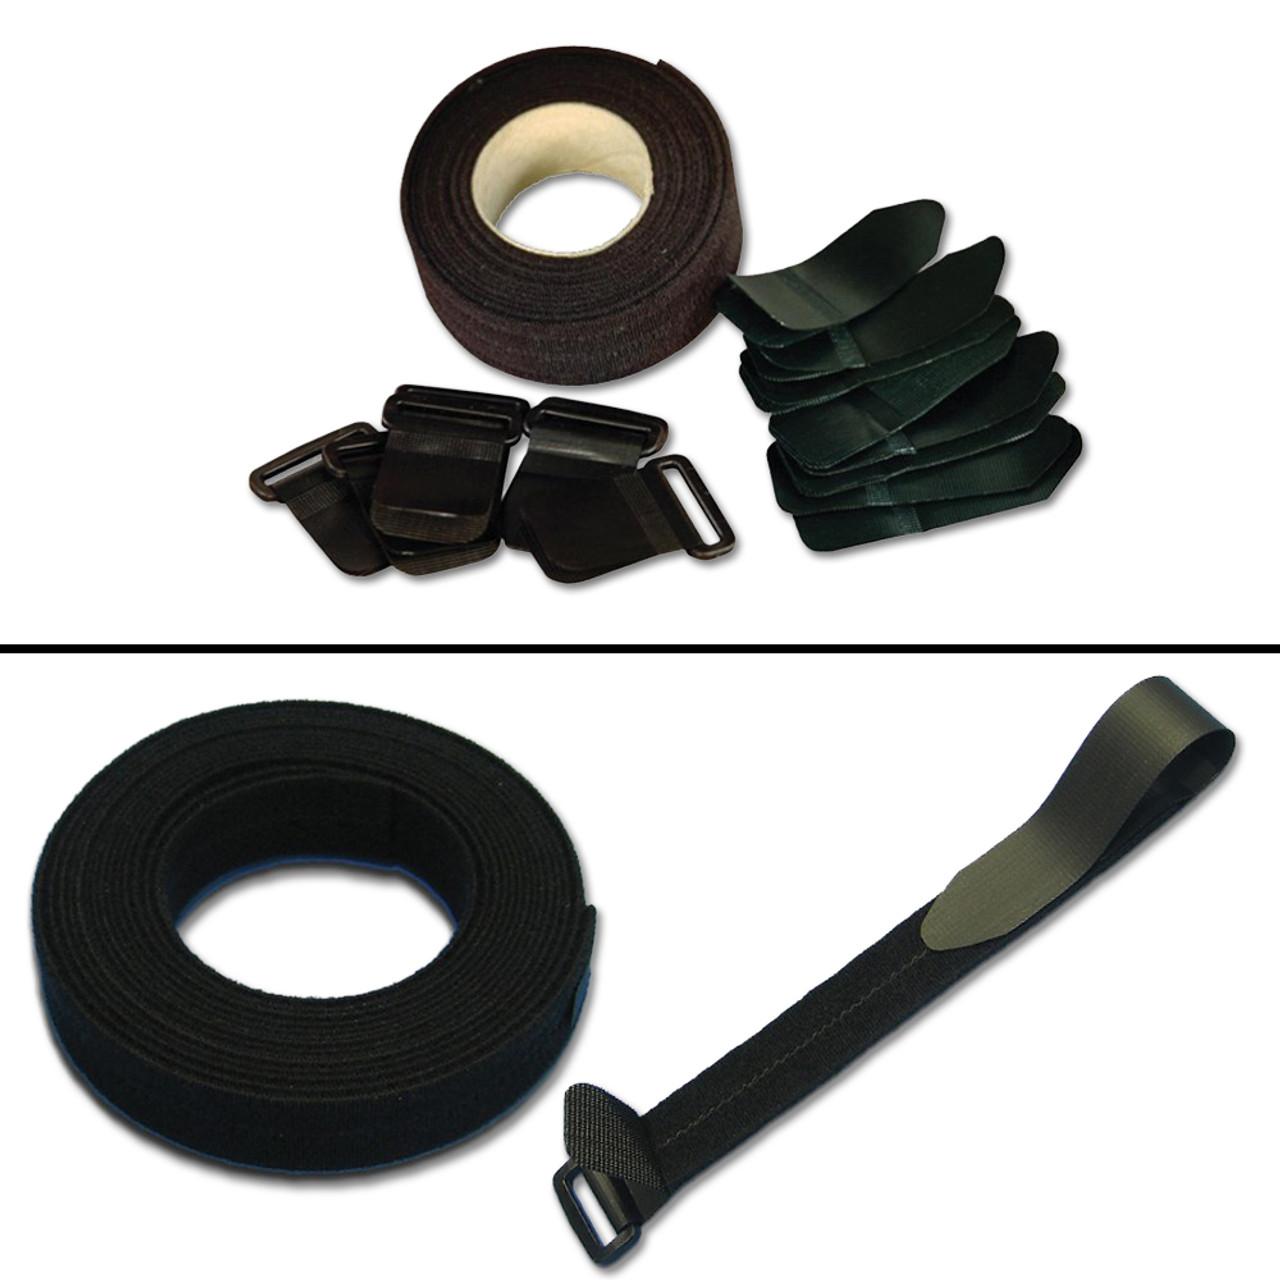 FASTENup™ Strap Kit